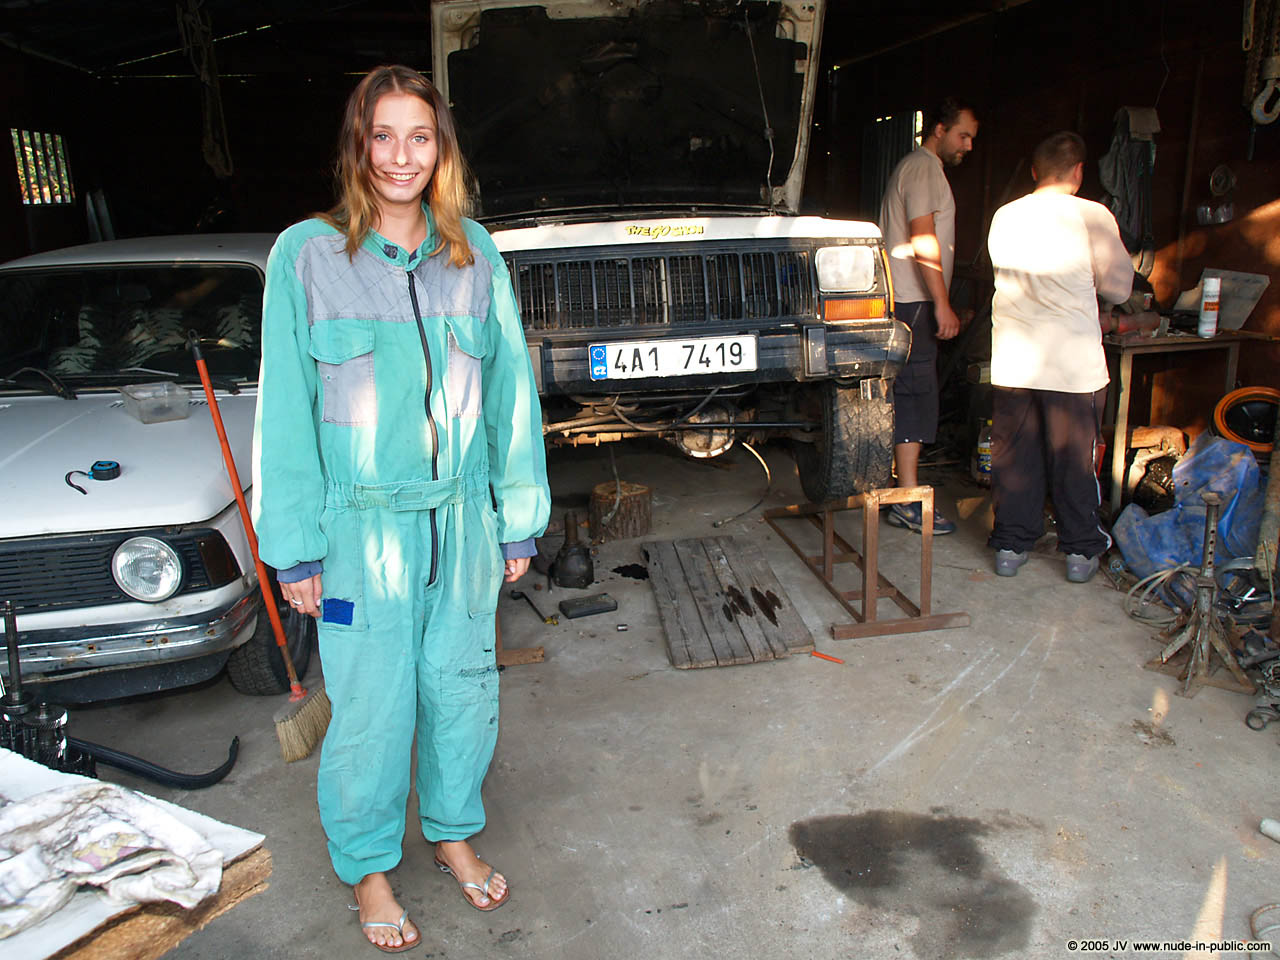 veronika-e-junkyard-cars-mechanic-nude-in-public-01